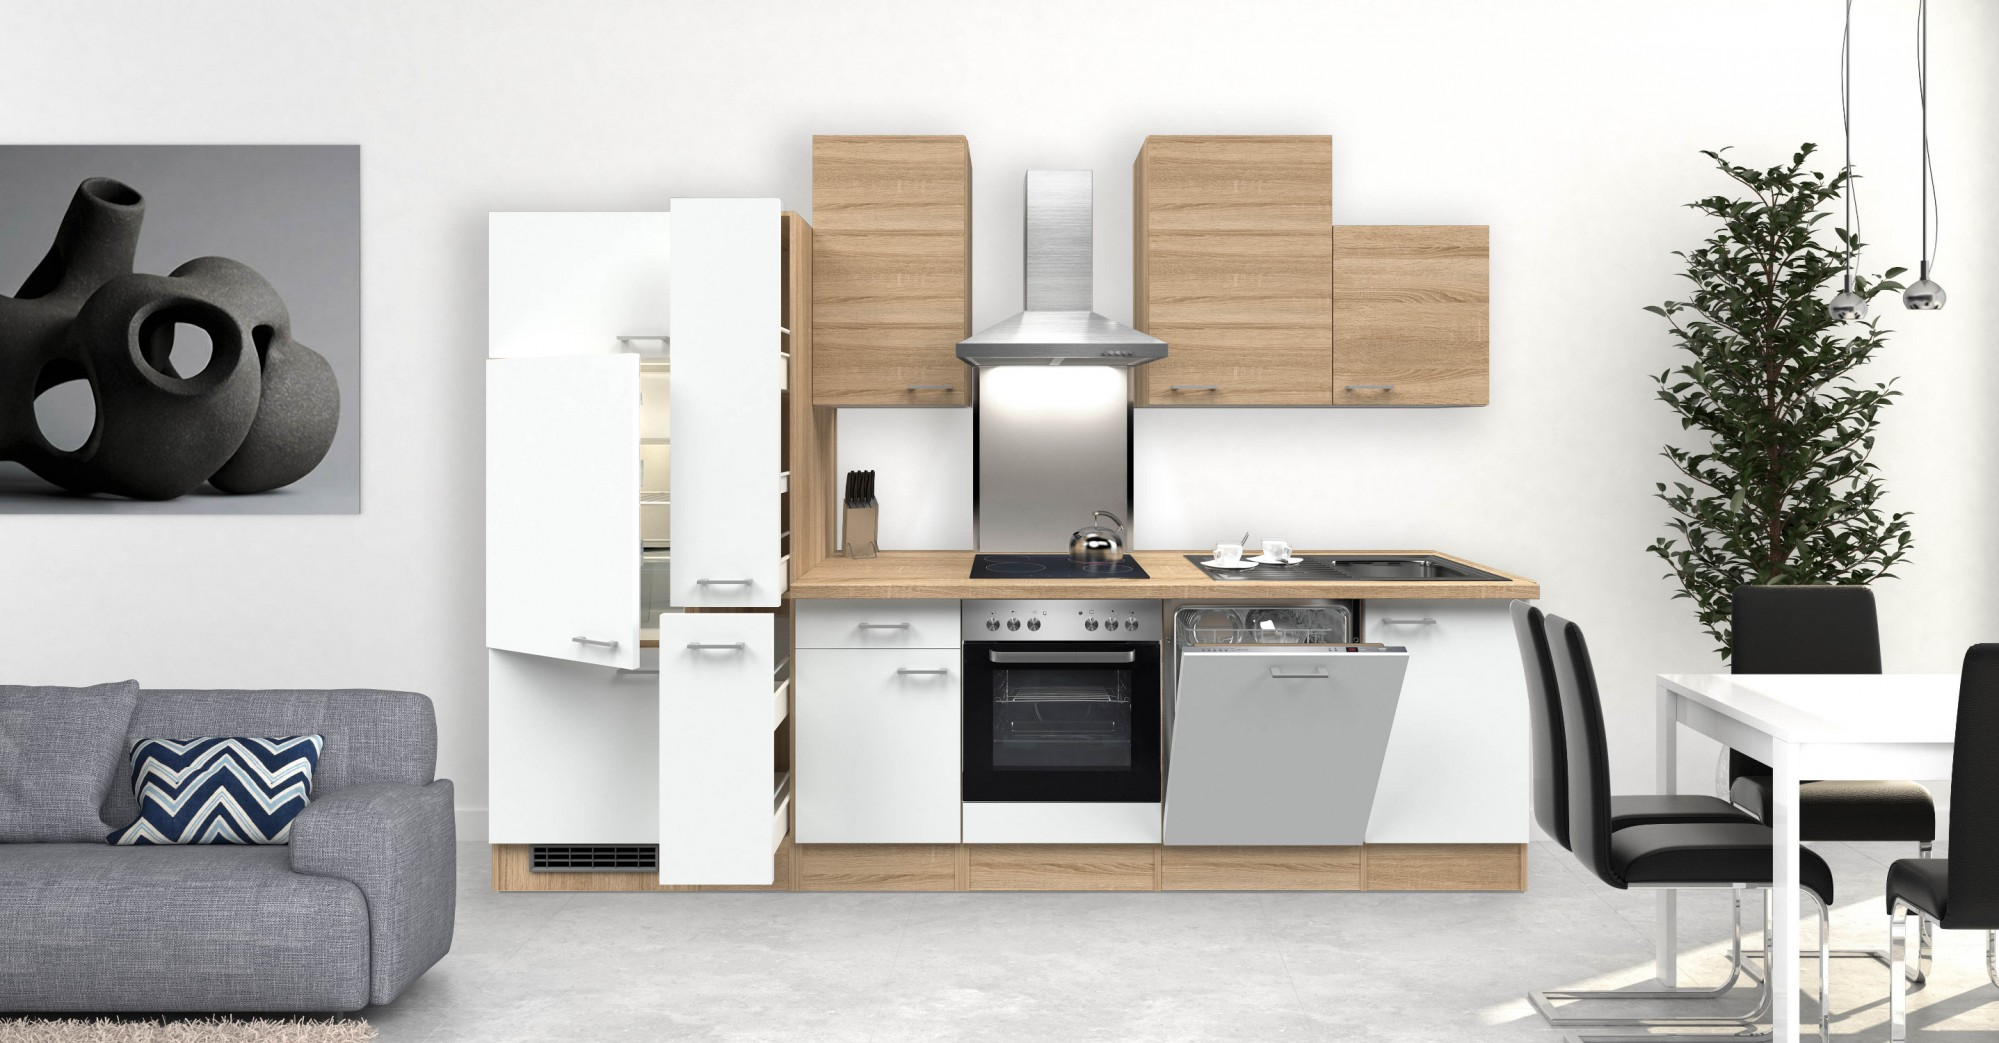 neu k chen h ngeschrank rom k chenschrank oberschrank. Black Bedroom Furniture Sets. Home Design Ideas